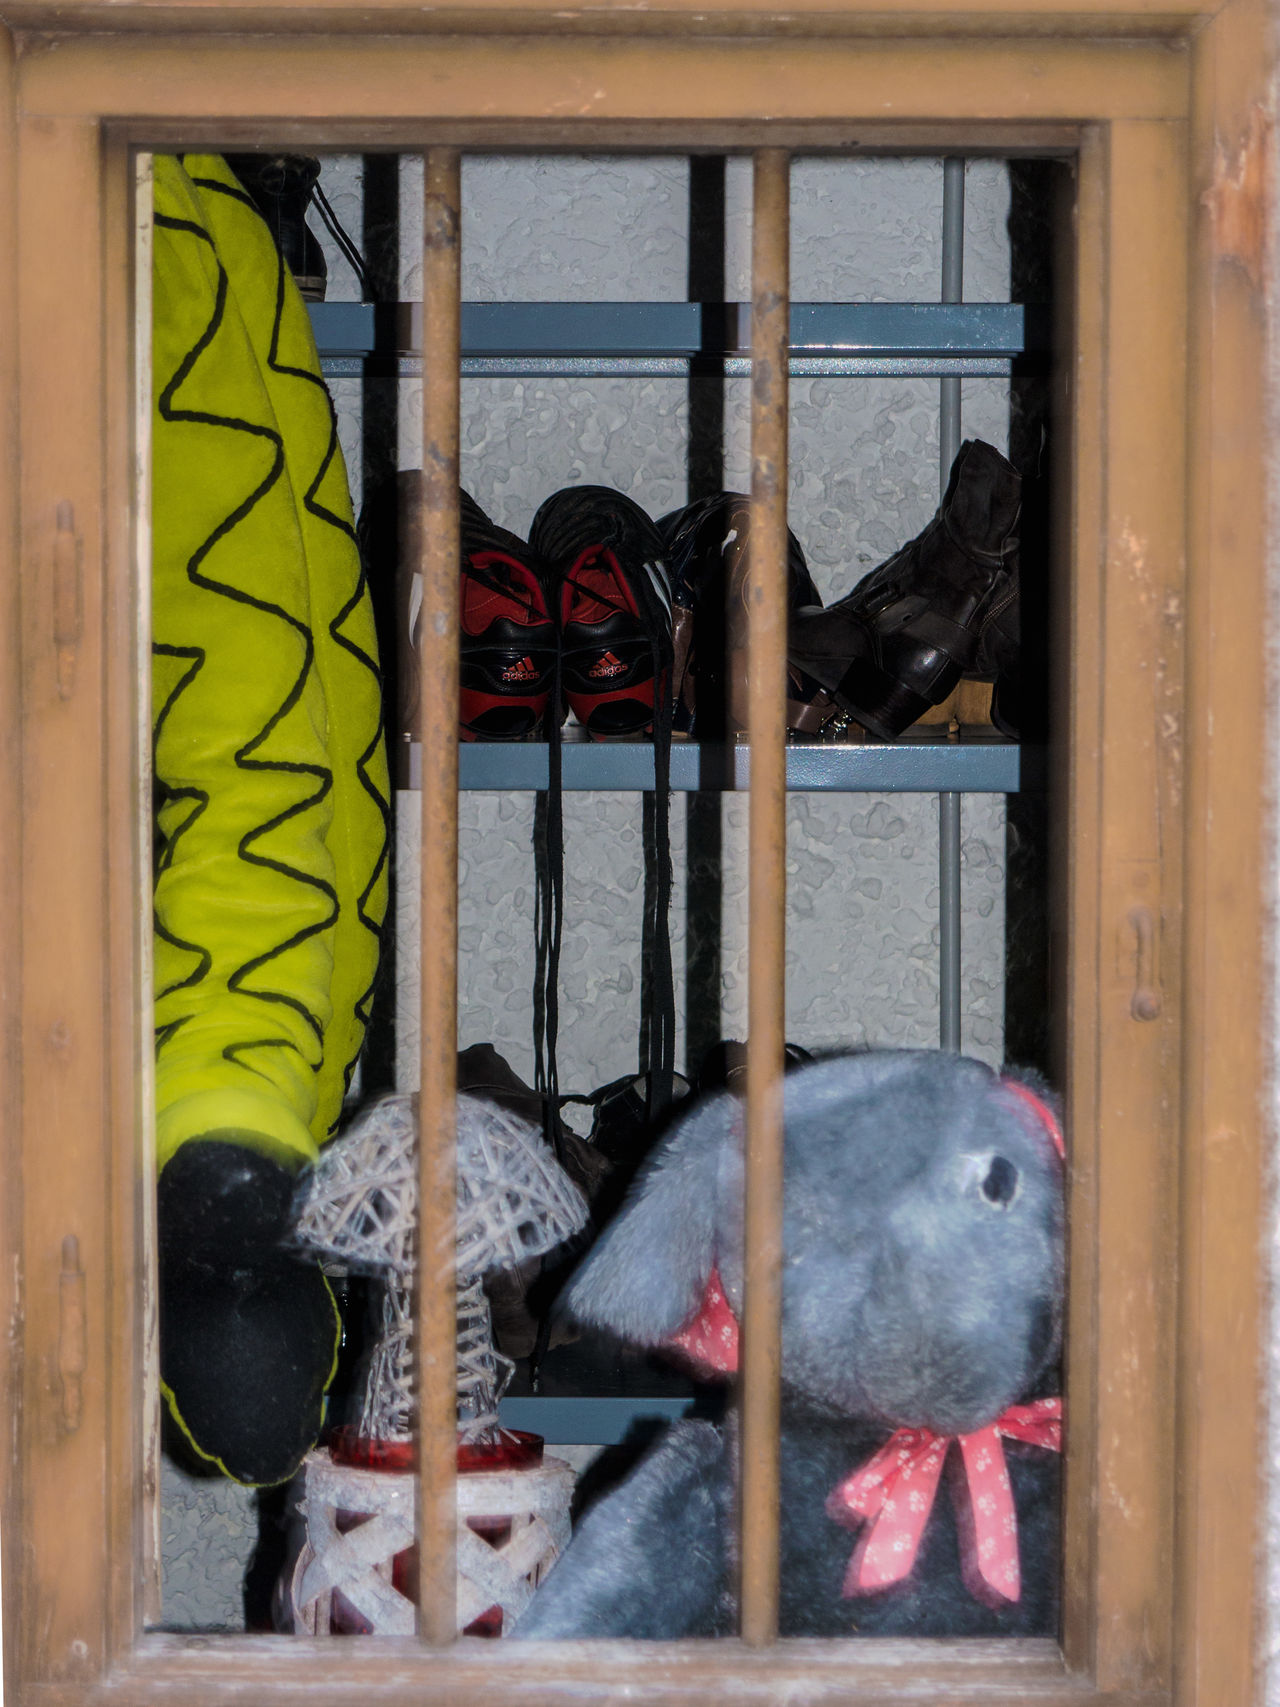 Animal Themes Animals In Captivity Cage Close-up Day Elephant StoreLife Livestock Mammal Mushroom No People Steinhaus Suedtirol Toy Adventures Toy Photography Toycrewbuddies Toyphotography Valle Aurina Zoo Zoology Elephant ♥